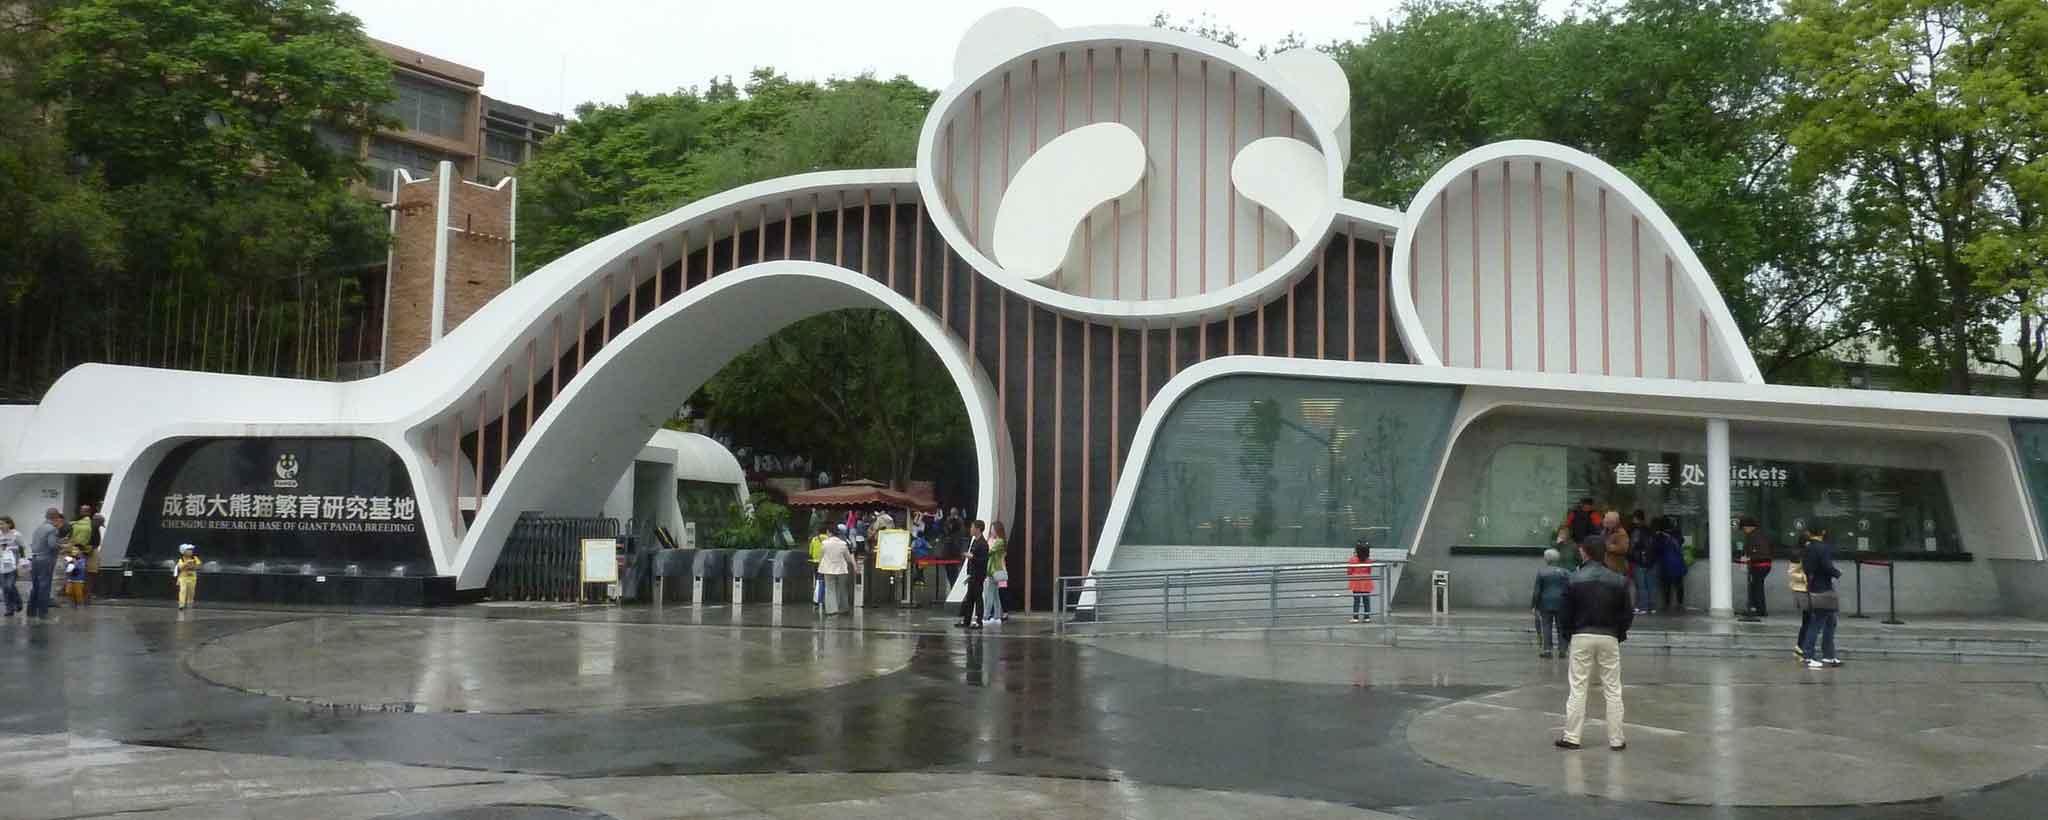 Virtual reality at Chengdu Research Base of Giant Panda Breeding